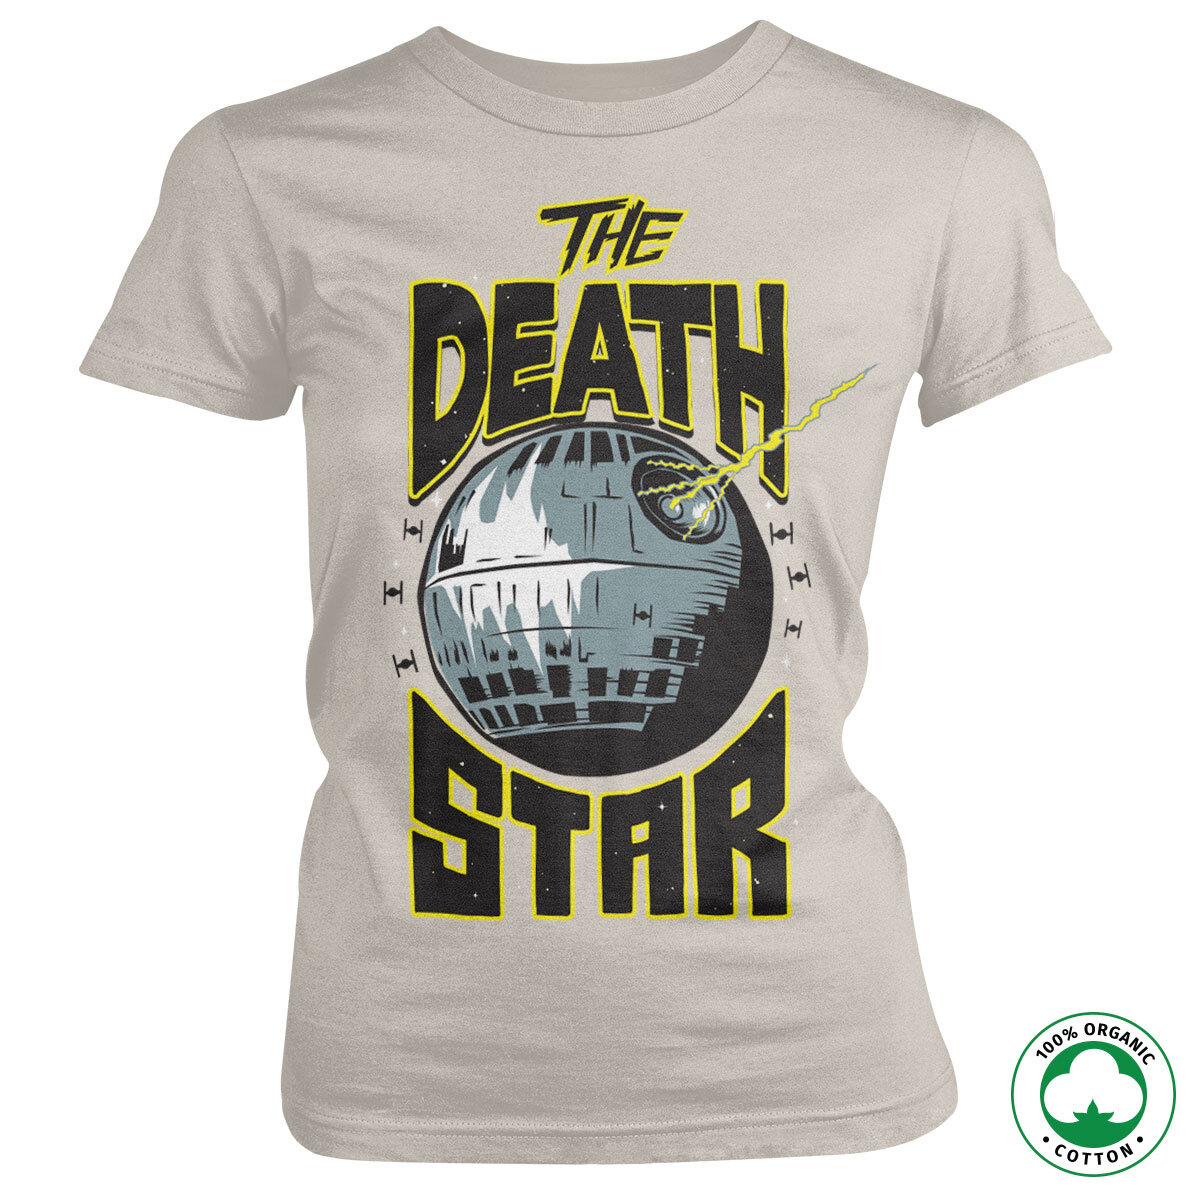 The Death Star Organic Girly Tee